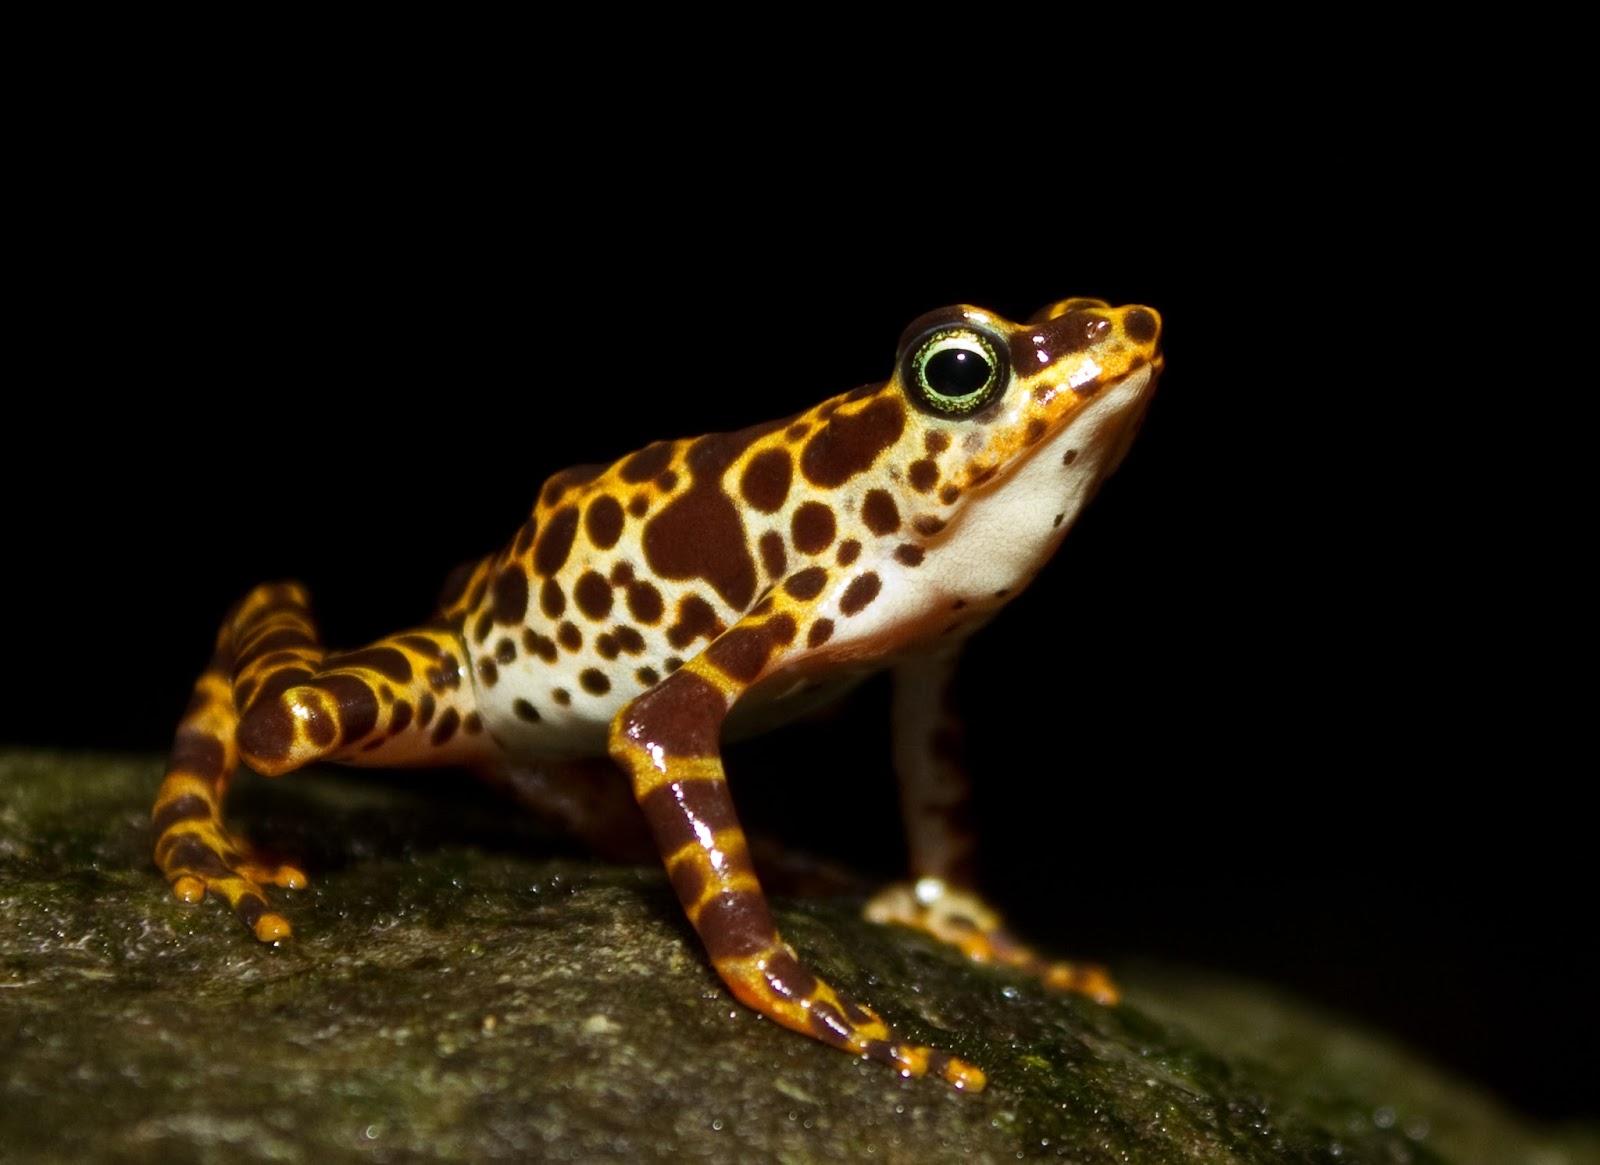 Amphibians: Atelopus certus calling male edit